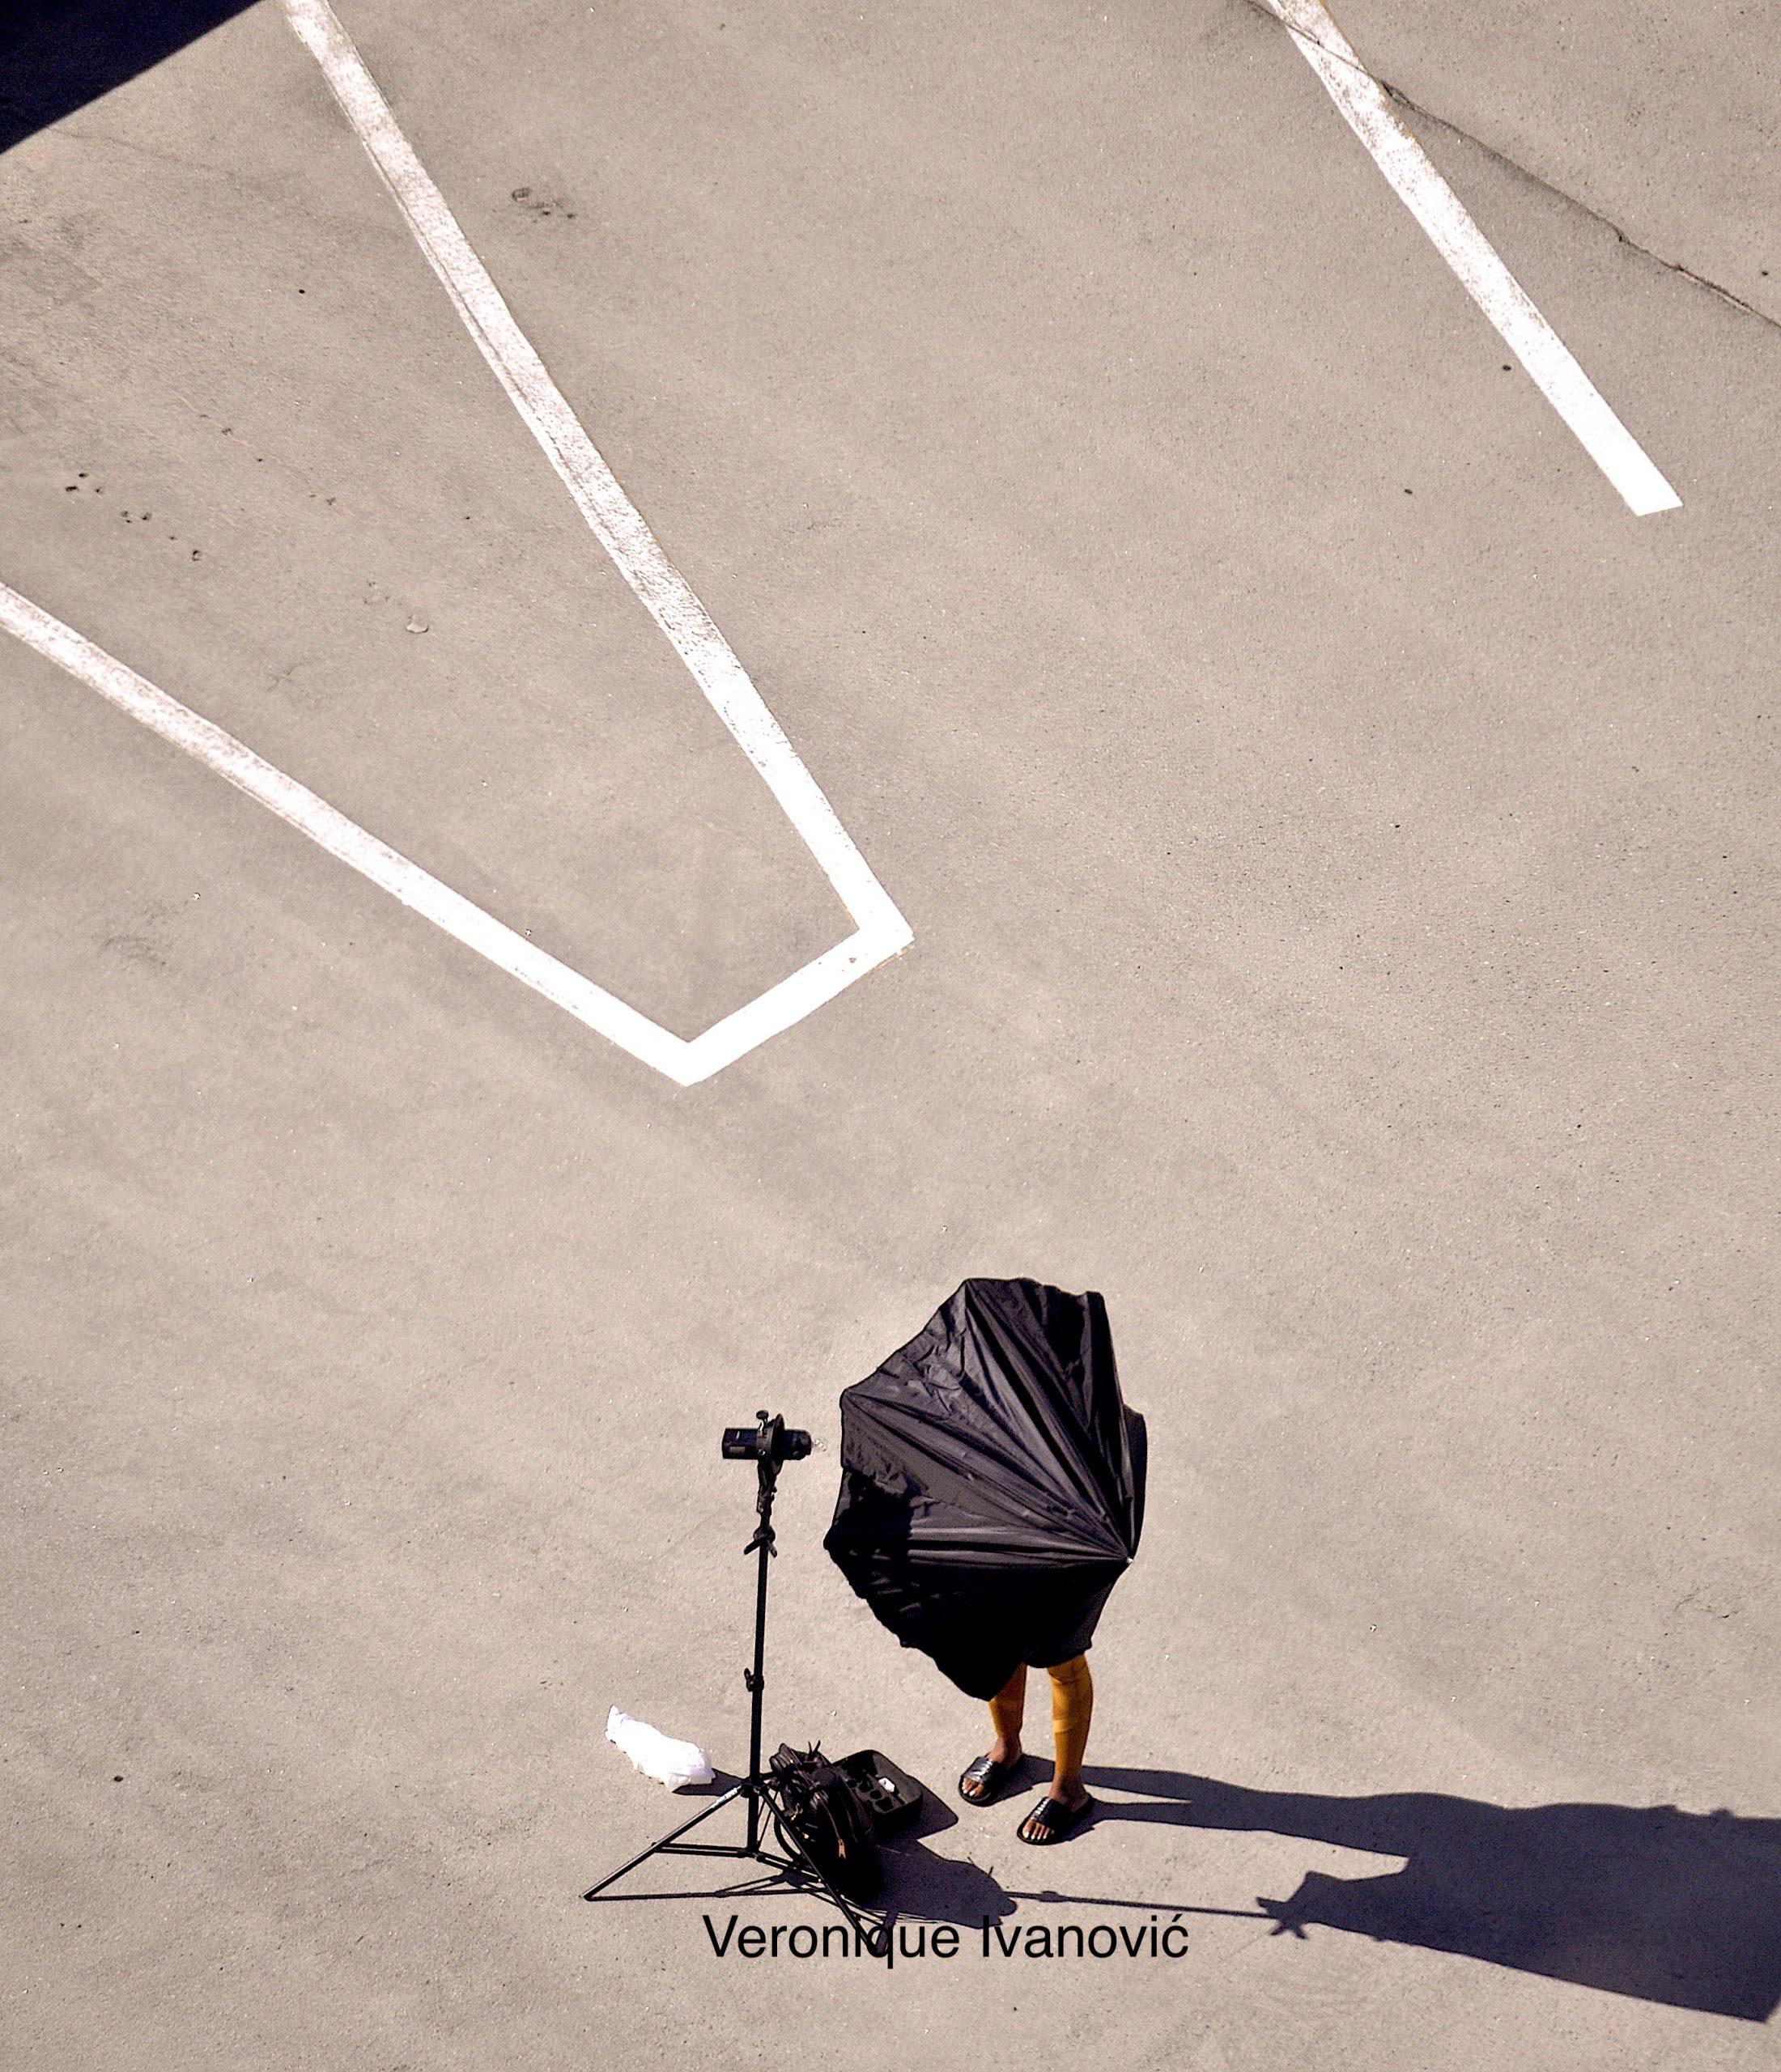 THE PHOTOGRAPHER PHOTOGRAPHED/LE PHOTOGRAPHE PHOTOGRAPHIÉ